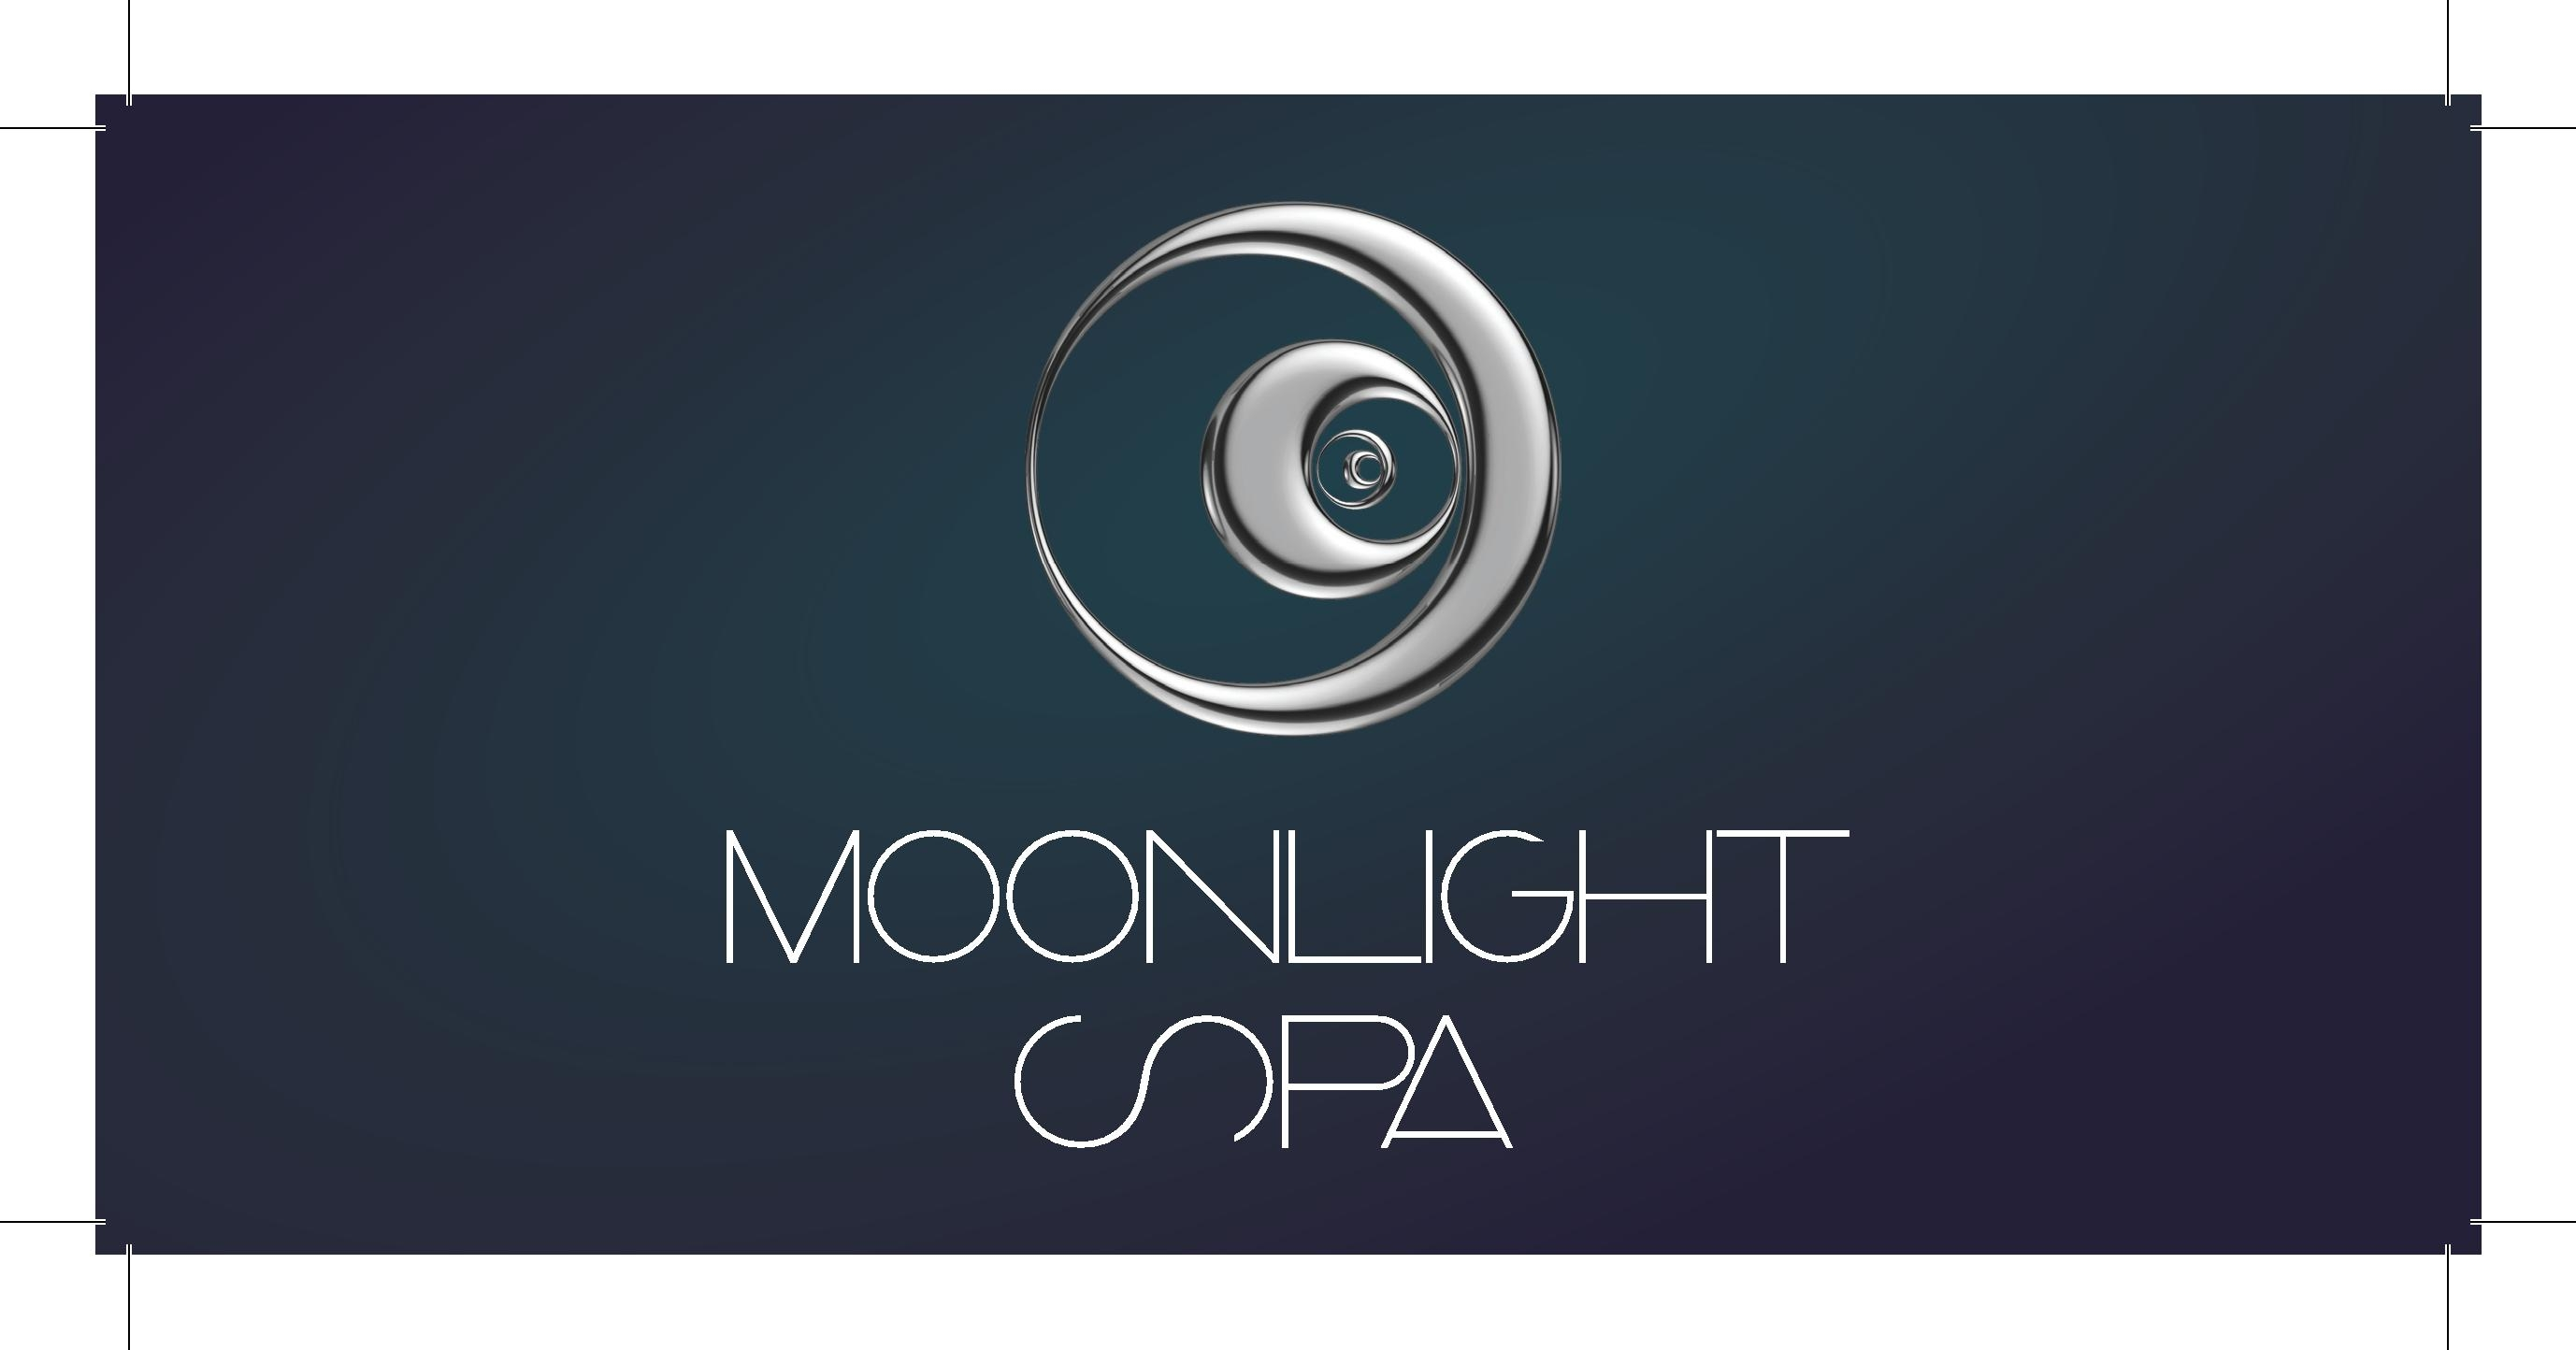 Akcja Lato: Moonlight Spa dla każdej mamy:)